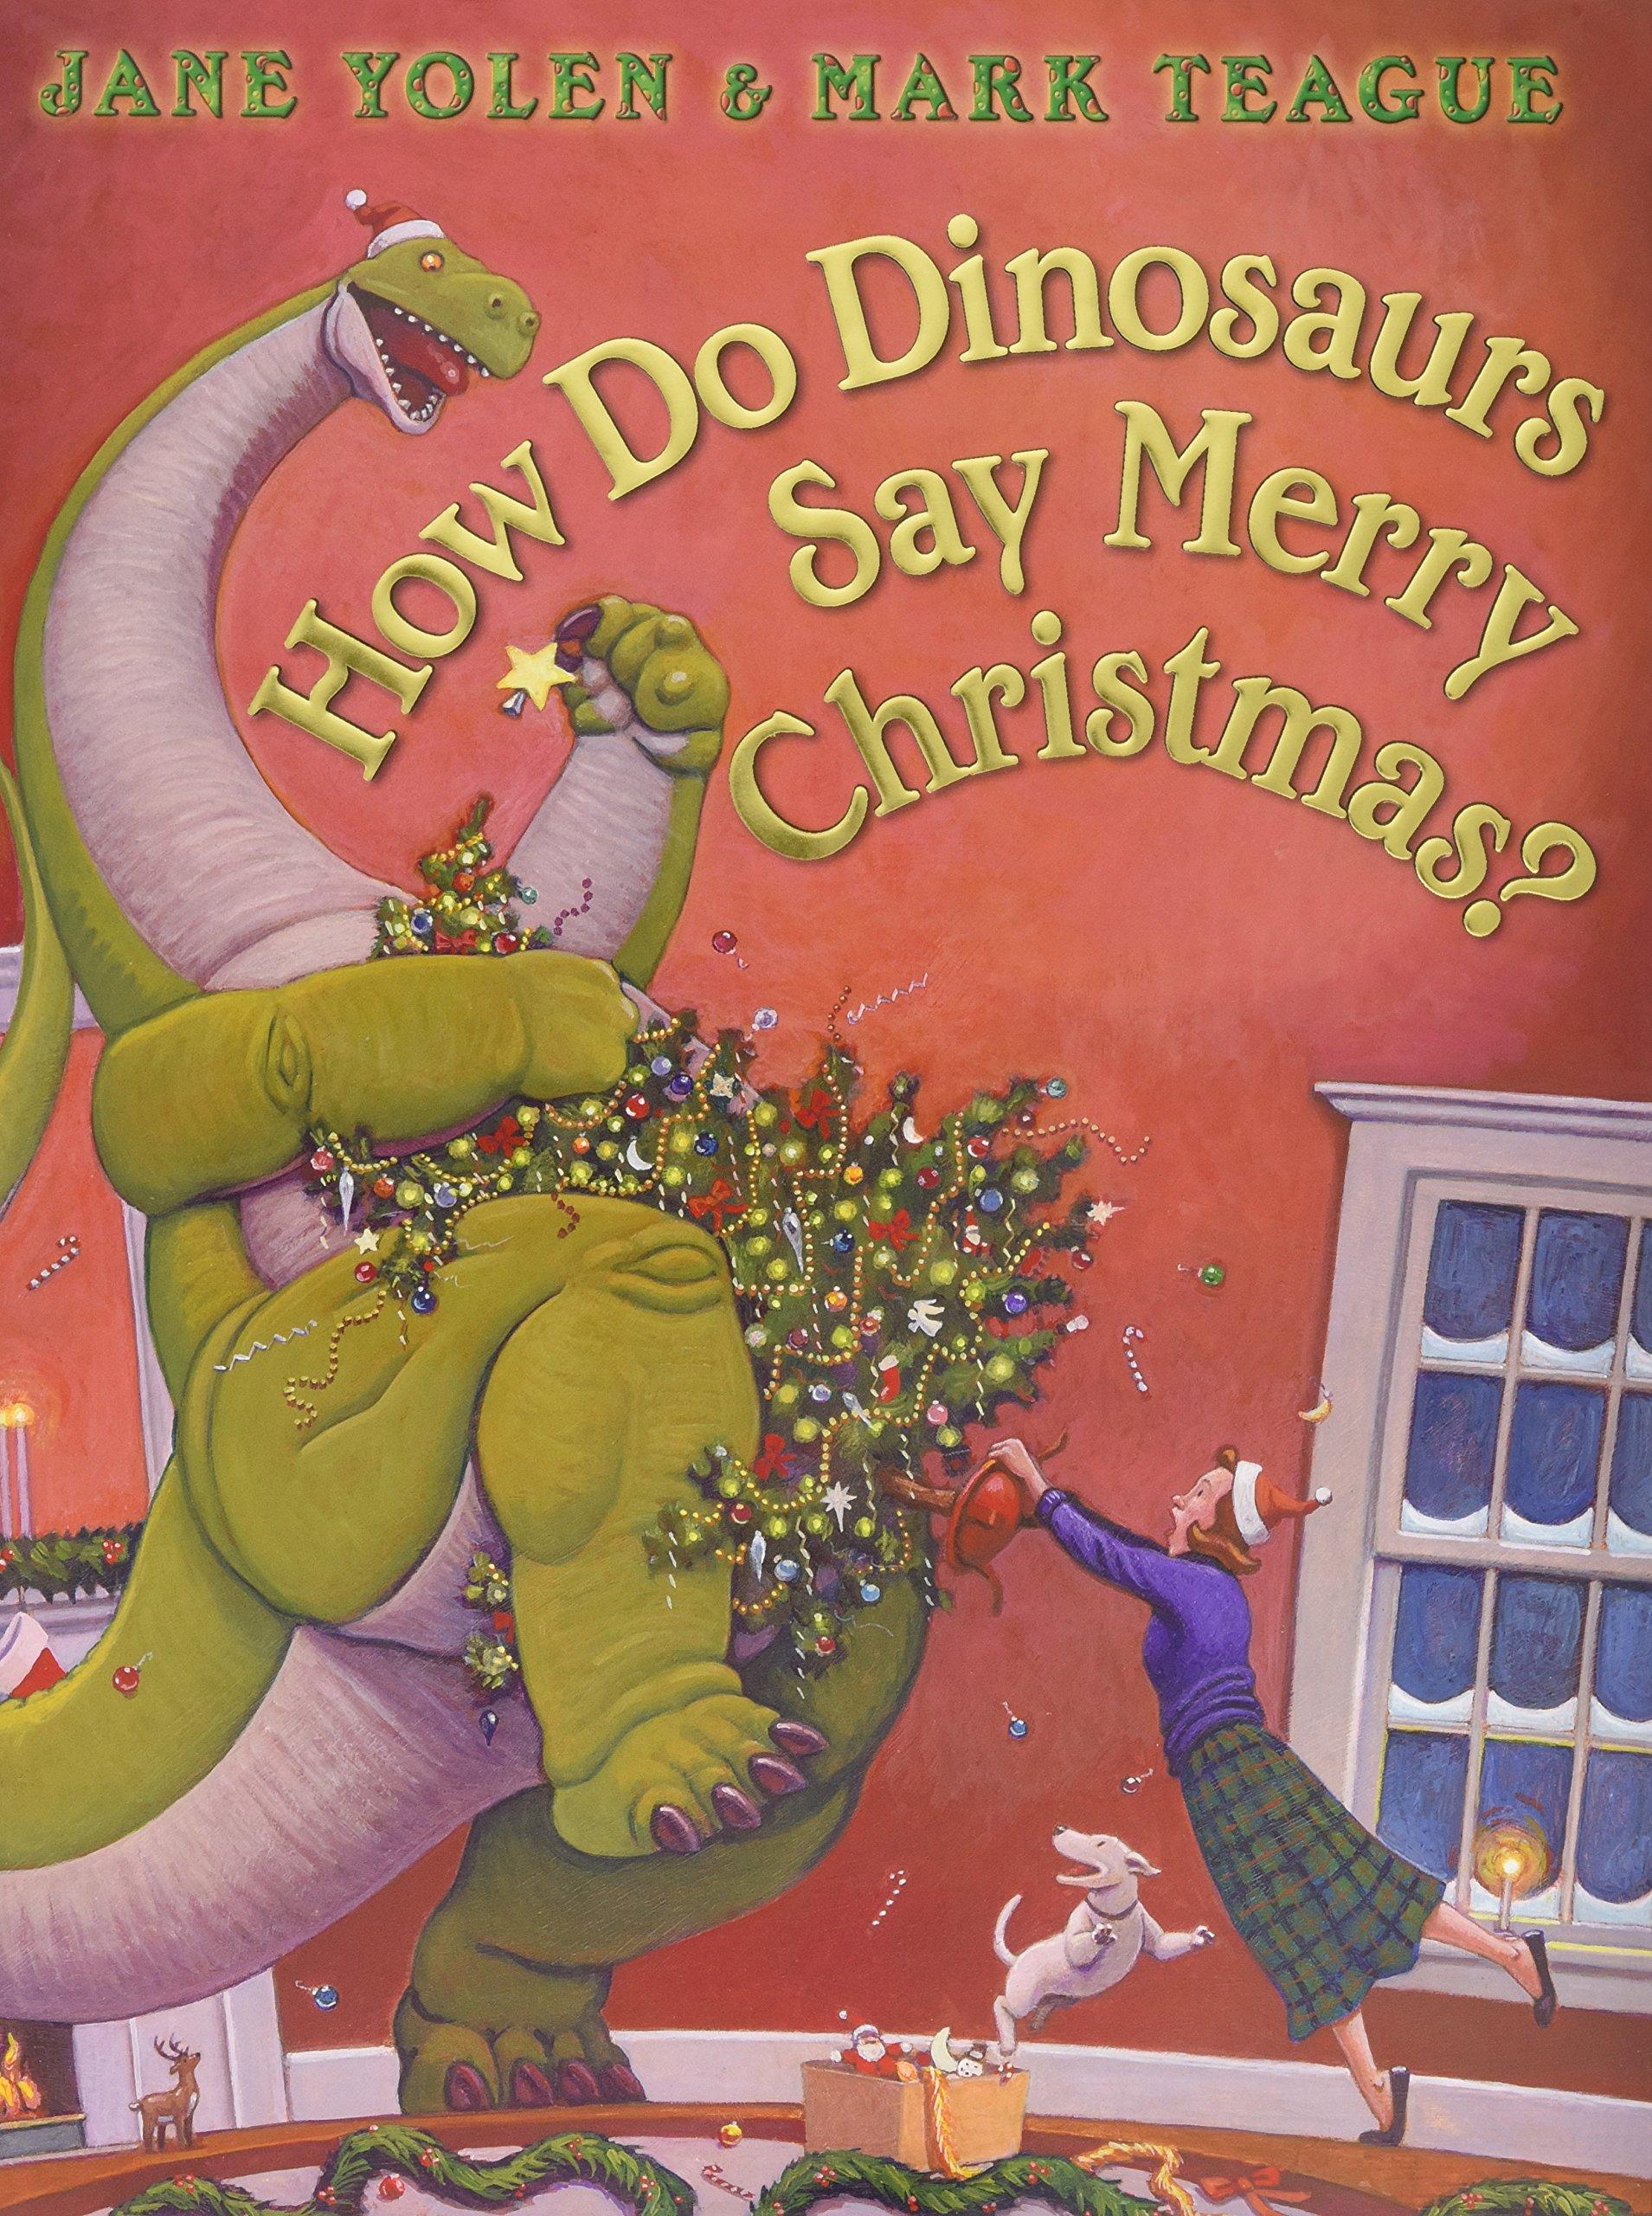 shegotguts - christmas books -how do dinosaurs say merry christmas.jpg